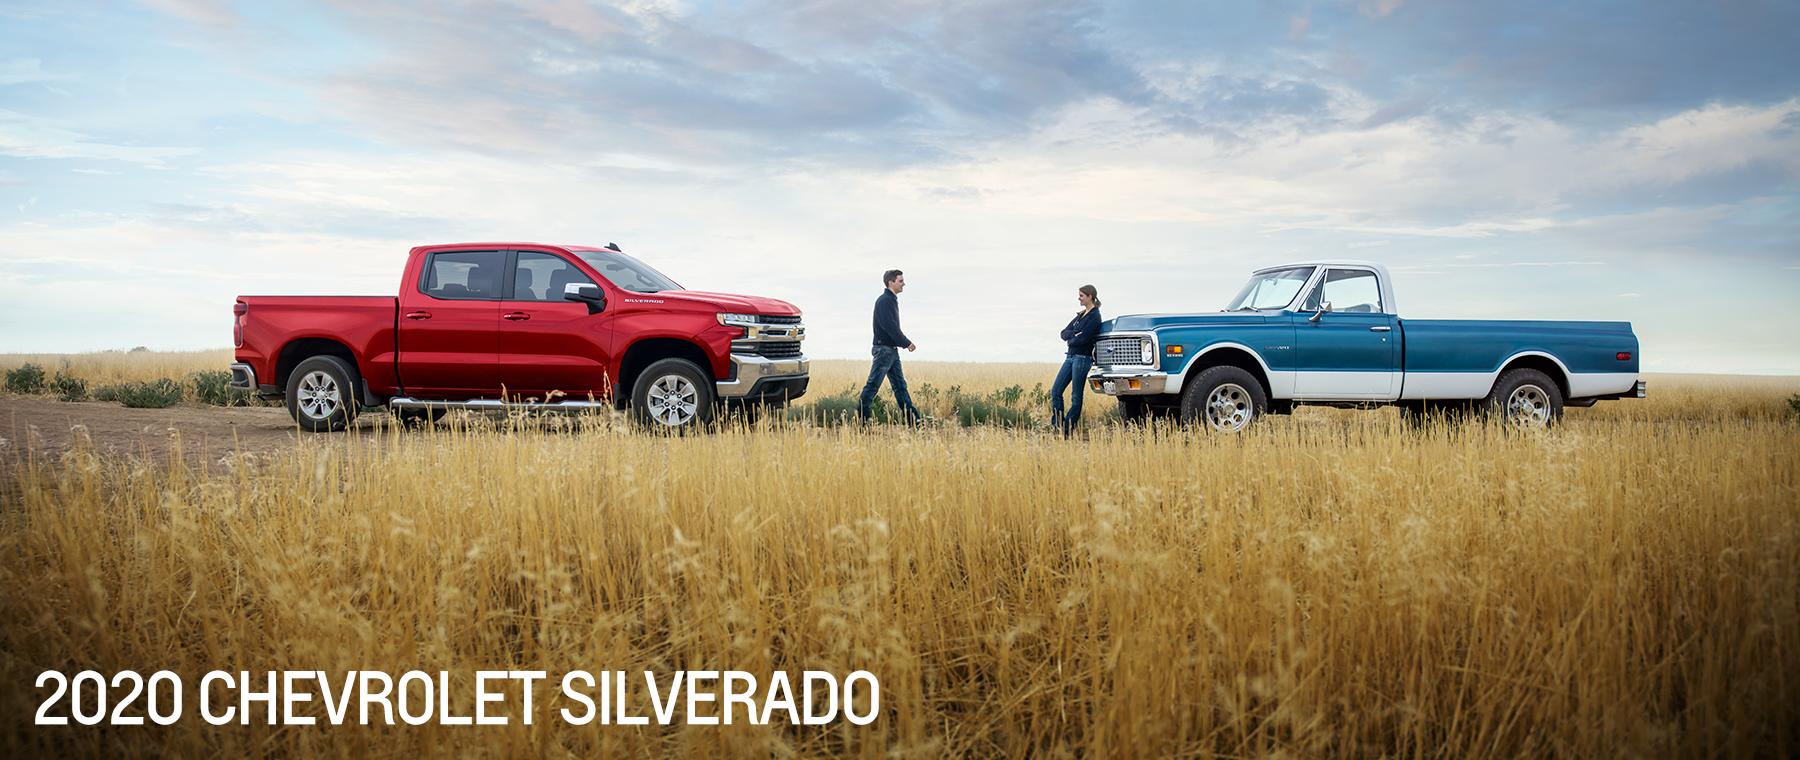 2020 Silverado and Old Body Style Silverado Side By Side